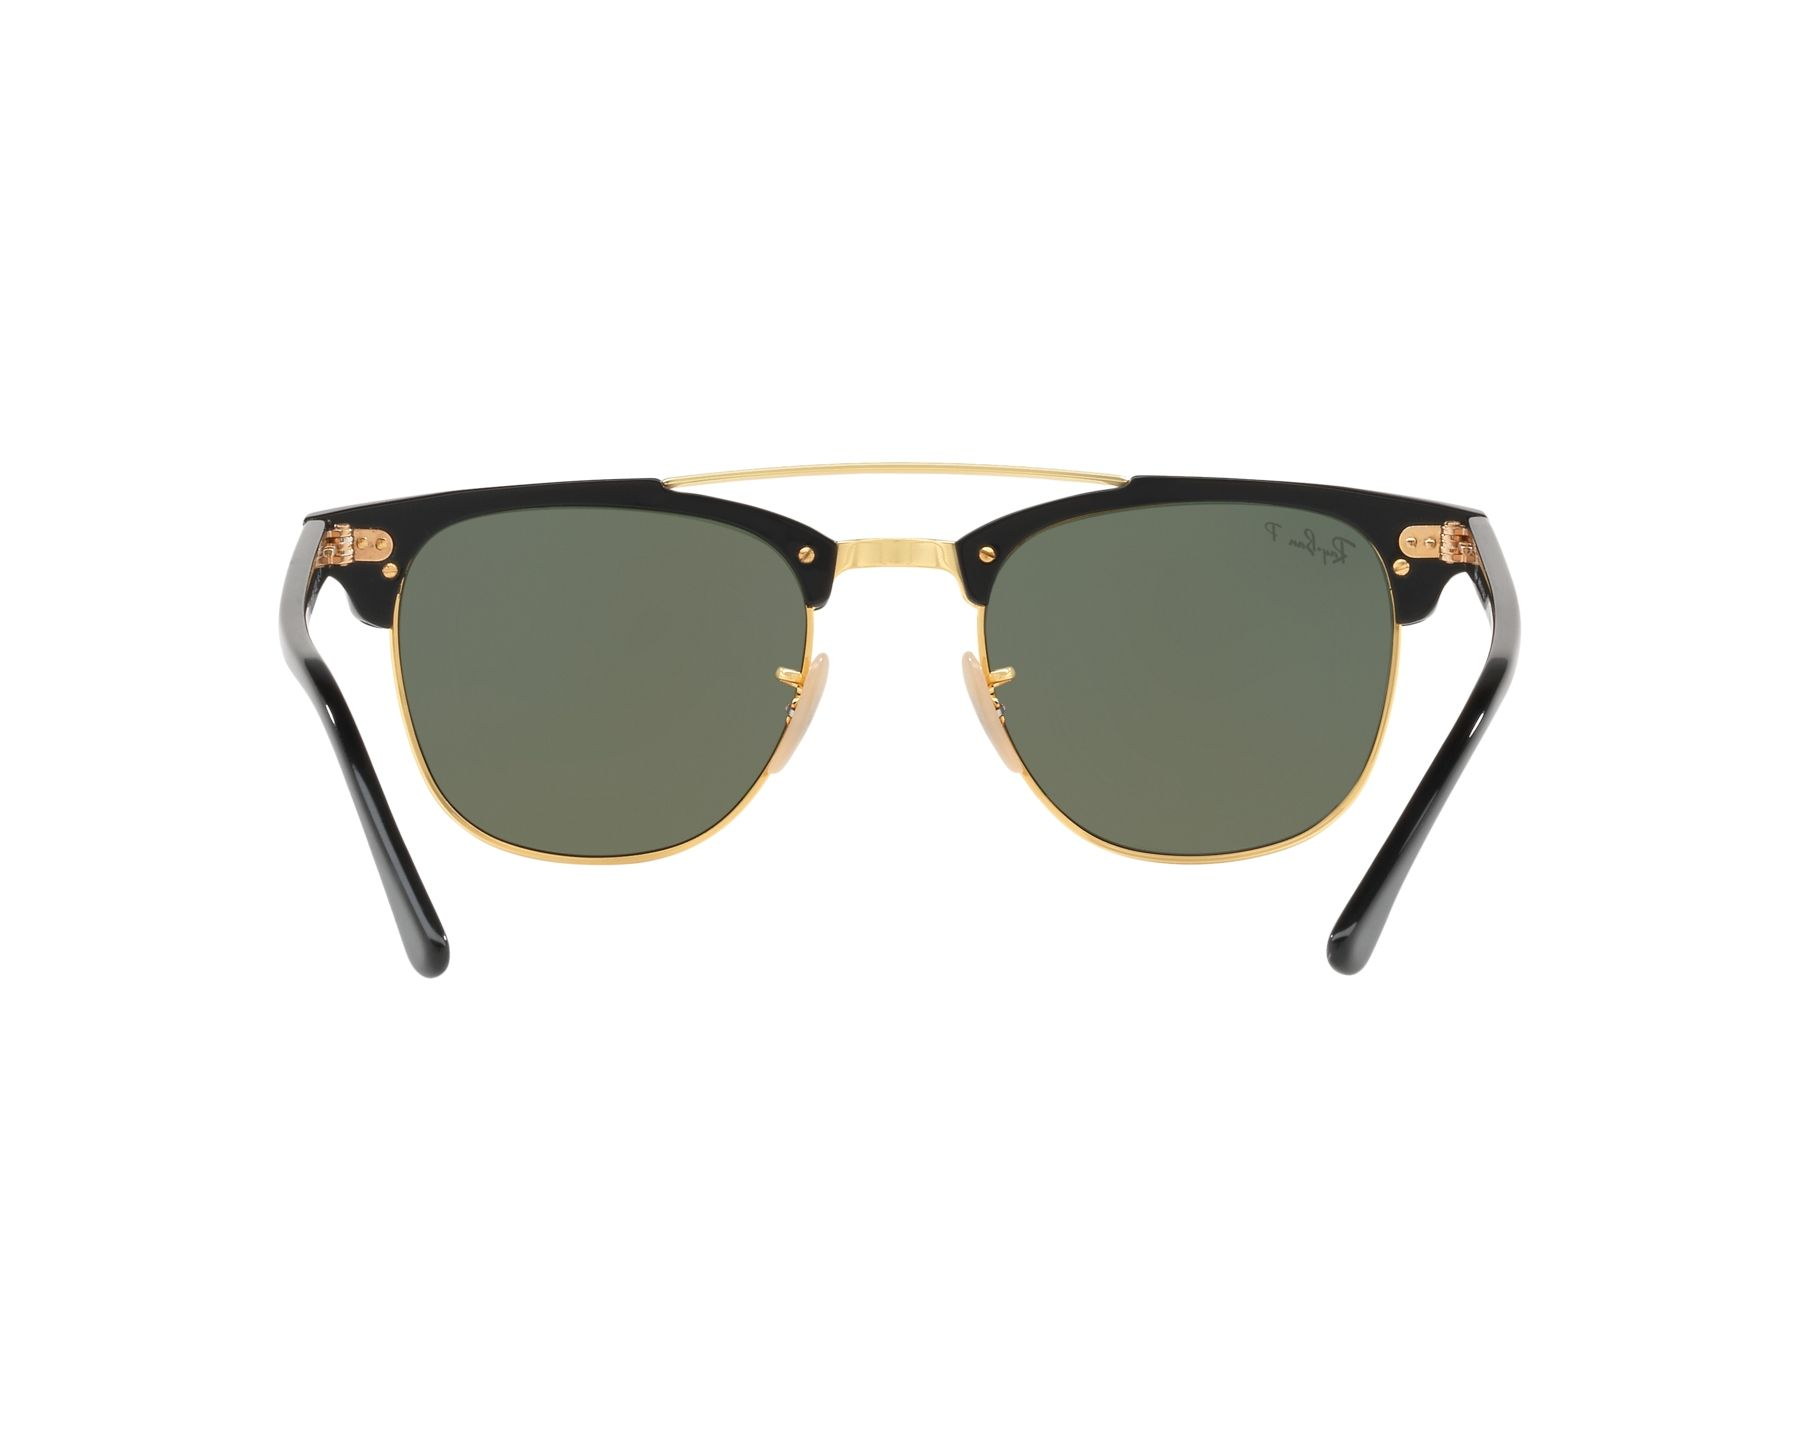 5398863b90e Sunglasses Ray-Ban RB-3816 901 58 51-21 Black Gold 360